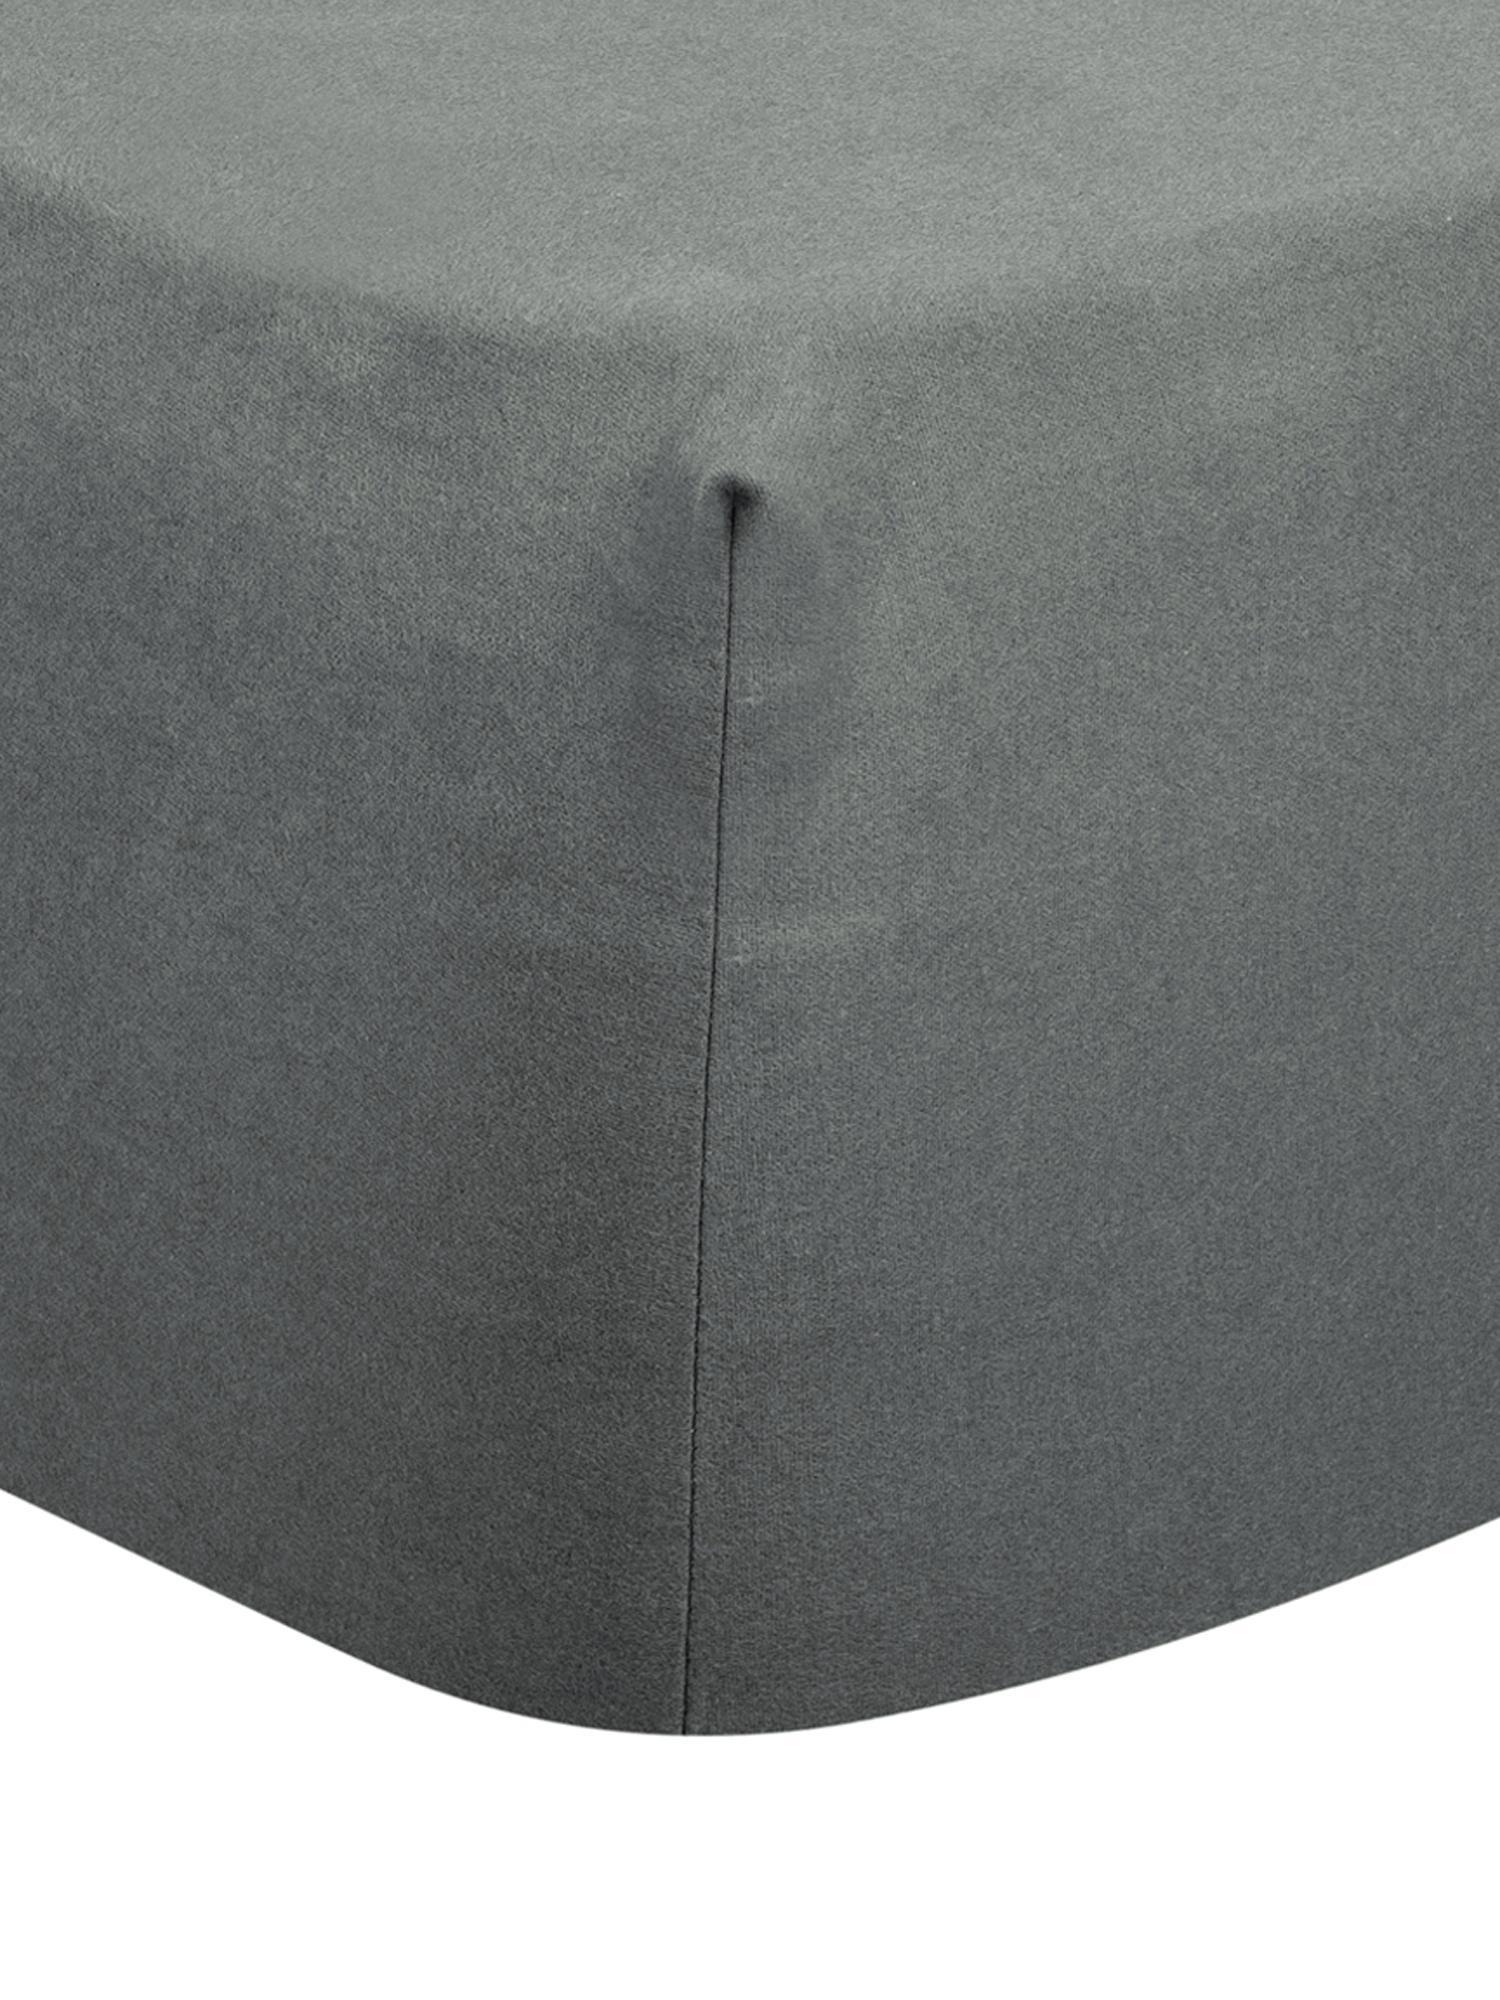 Sábana bajera de franela Biba, Gris oscuro, Cama 90 cm (90 x 200 cm)